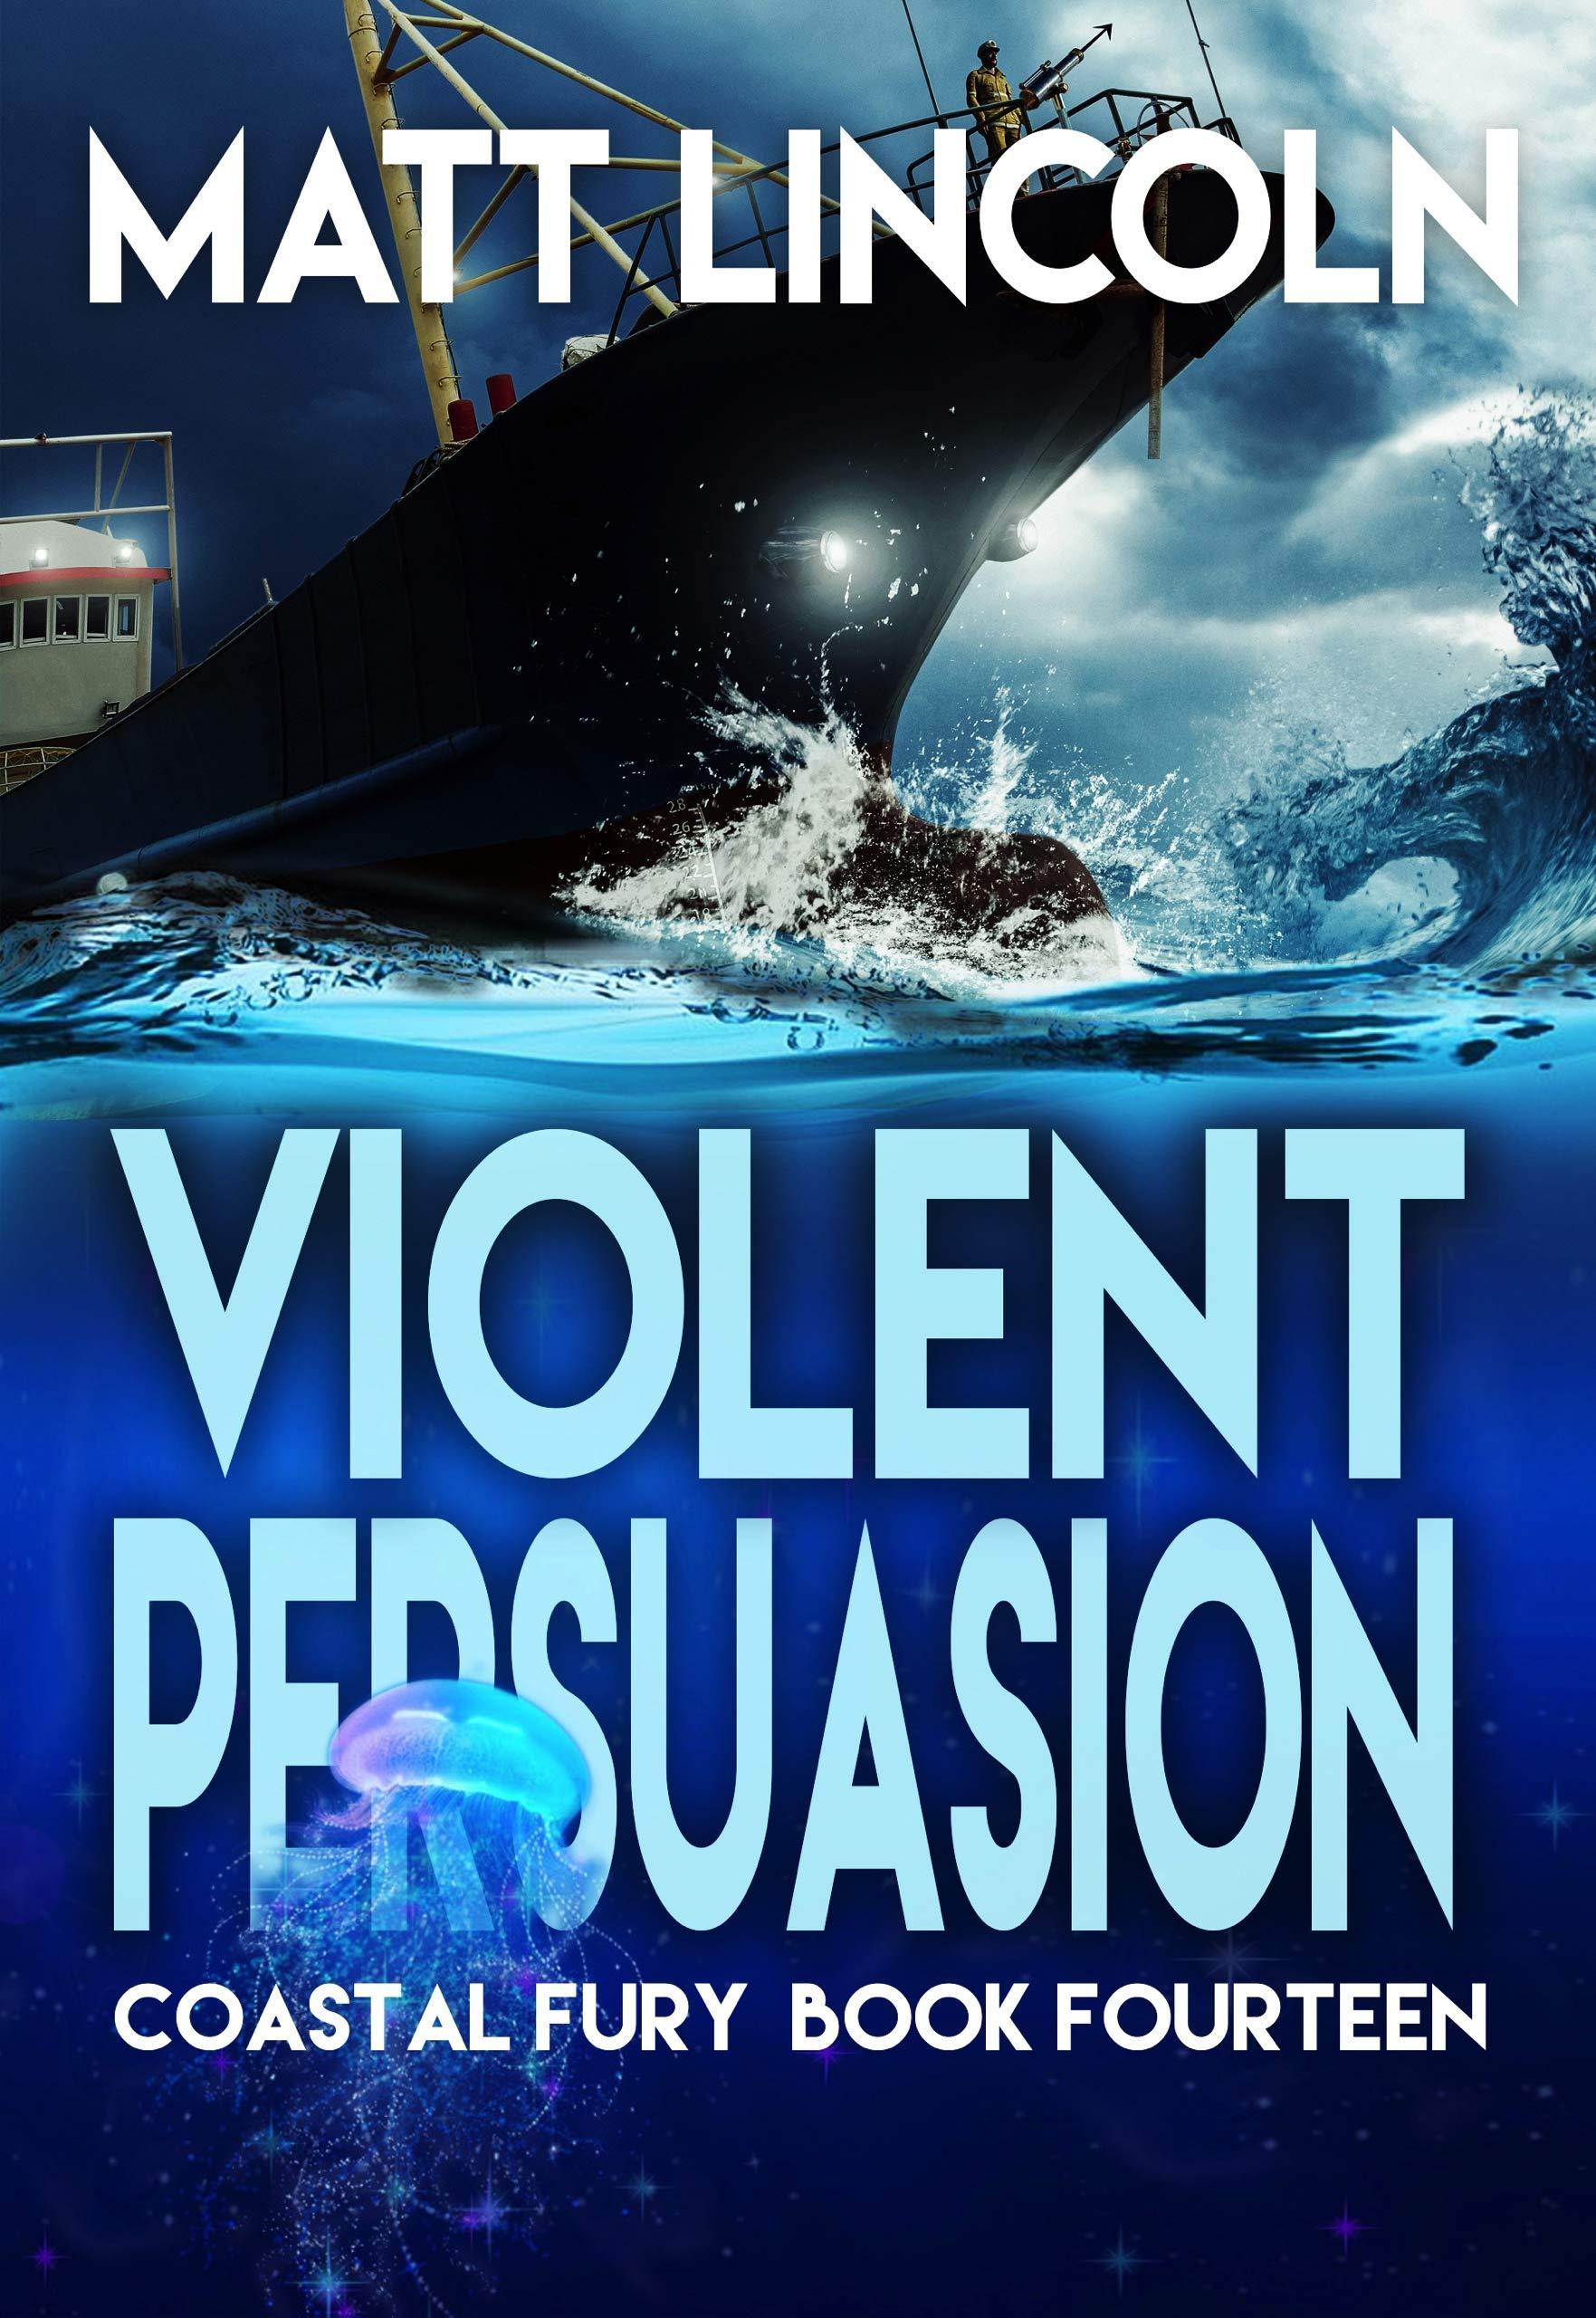 Violent Persuasion (Coastal Fury Book 14)